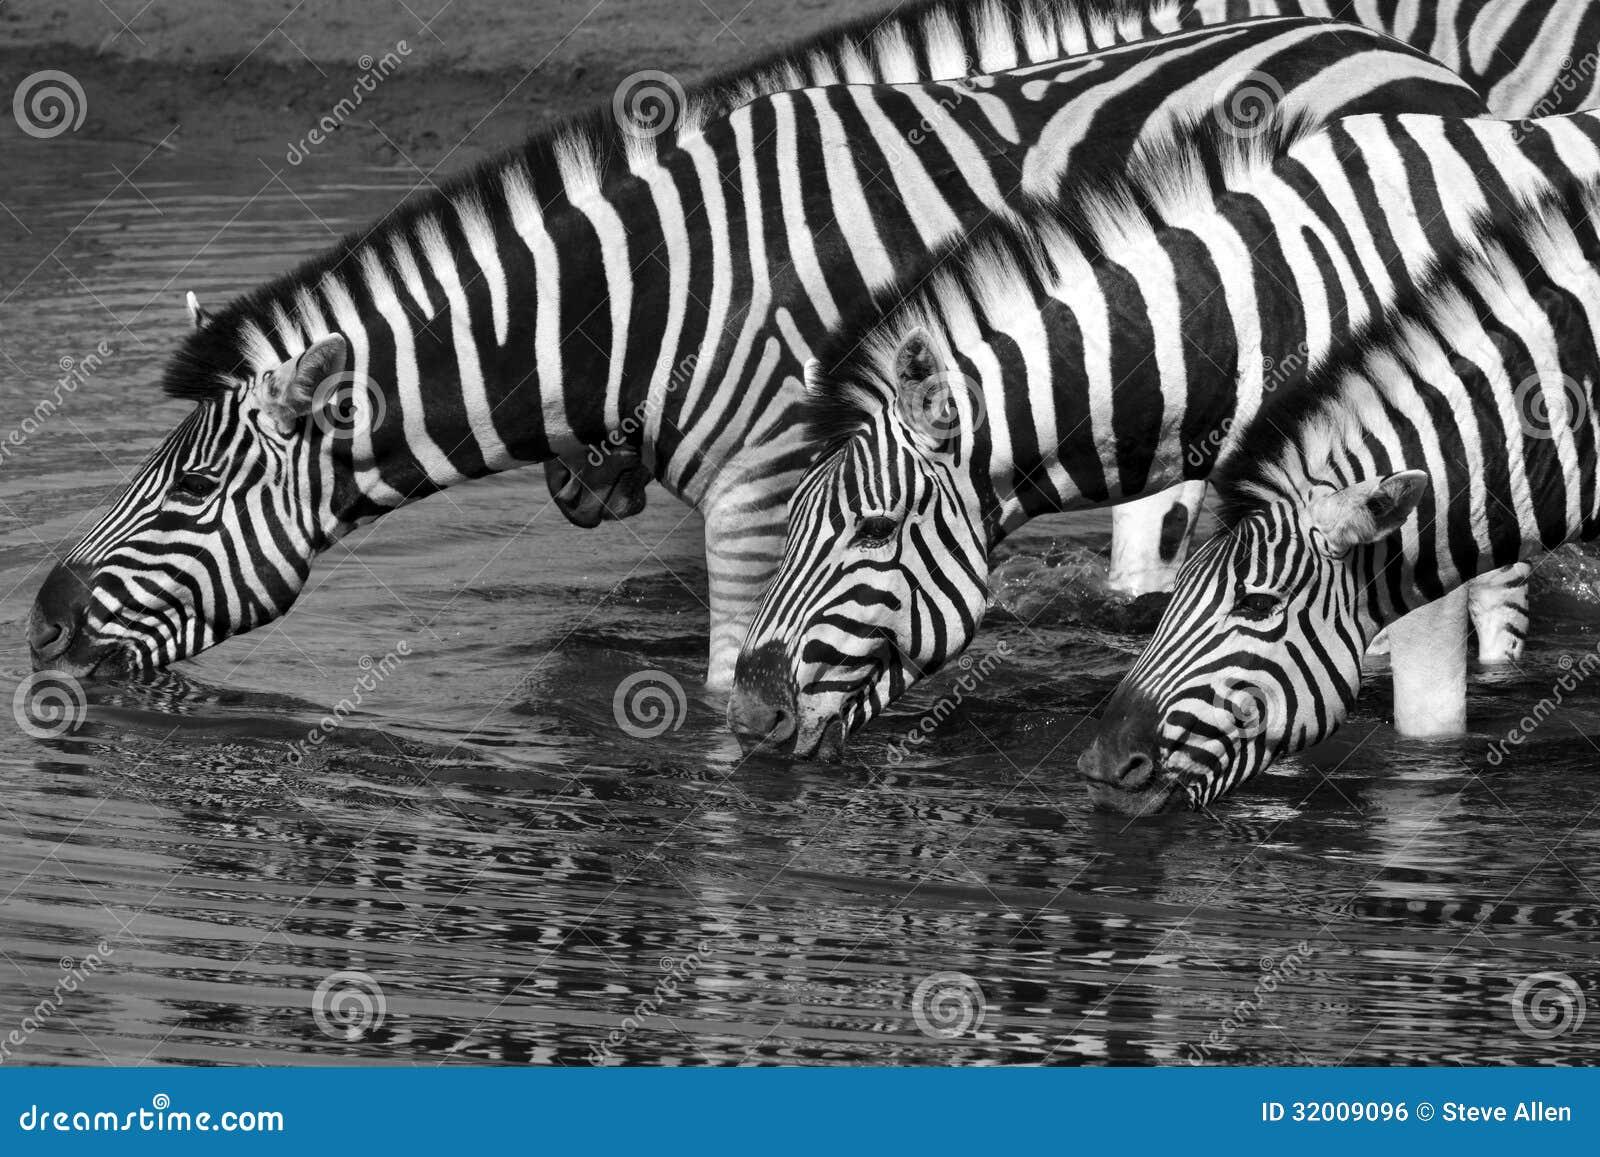 Cebra (quagga) del equus - parque nacional de Etosha - Namibia